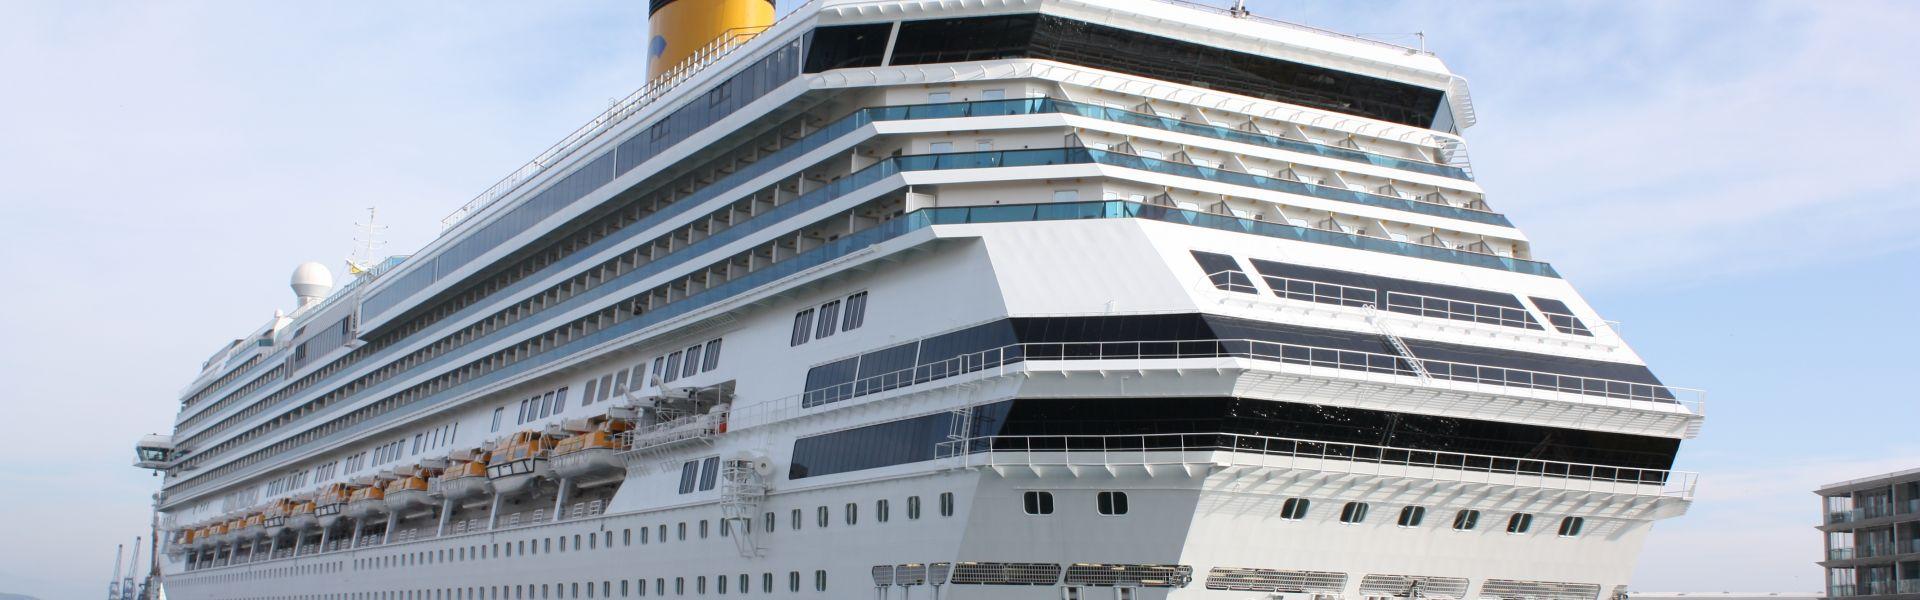 Croaziera 2018 - Capitalele Nordie (Kiel) - Costa Cruises - Costa Pacifica - 11 nopti